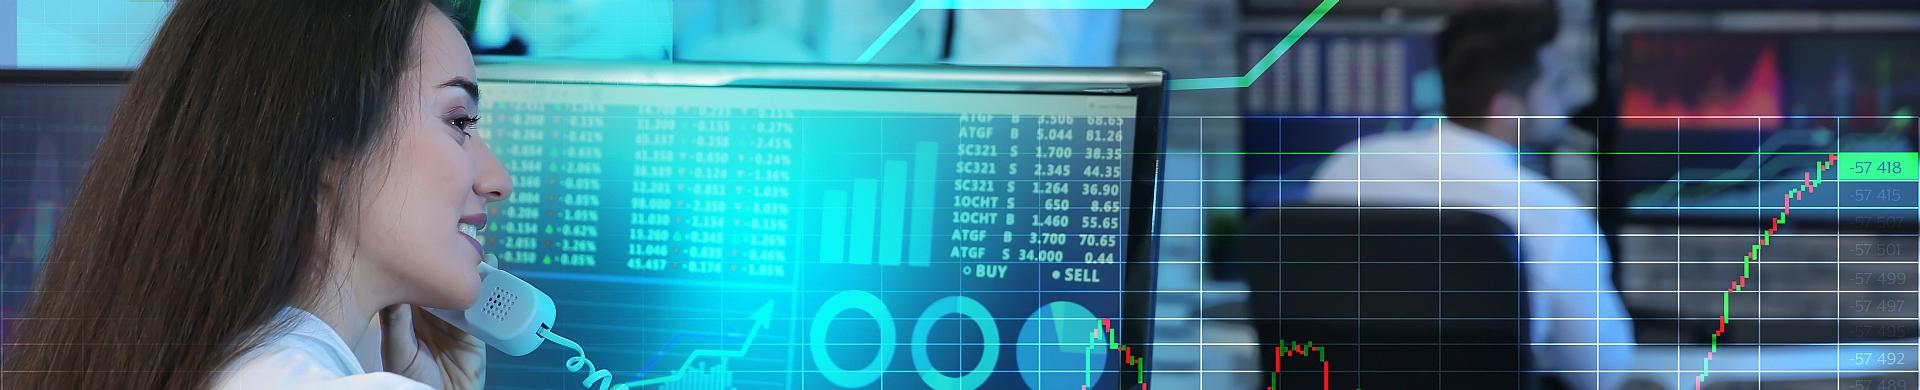 Gal Capital Market